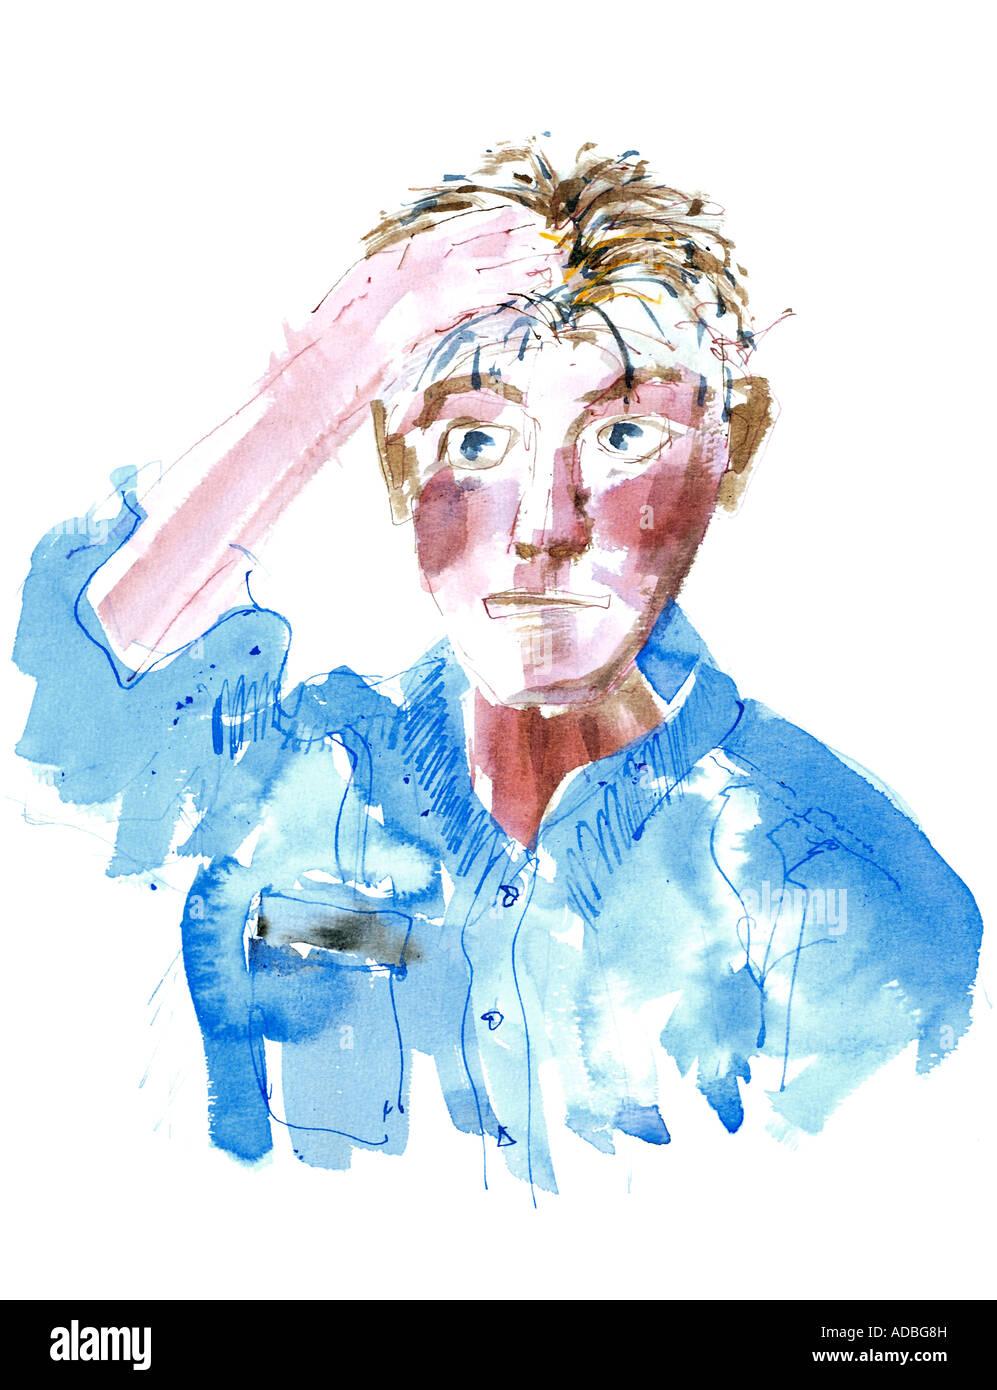 Self-portrait pen and wash drawing - Ed Buziak. - Stock Image